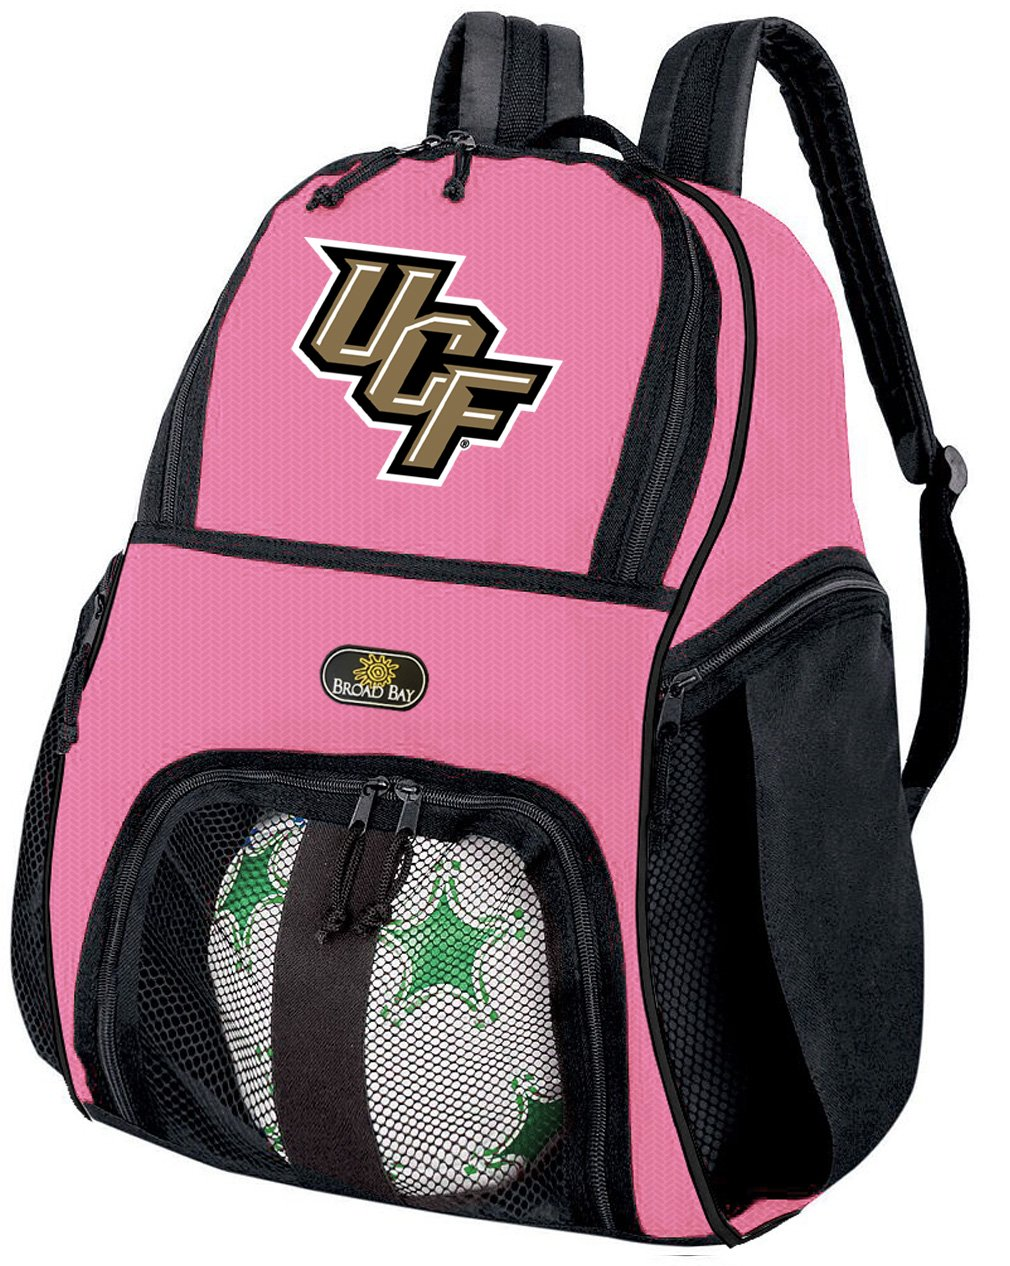 Girlsセントラルフロリダ大学サッカーボールバックパックまたはレディースバレーボールバッグボールキャリア B017A5VKS8